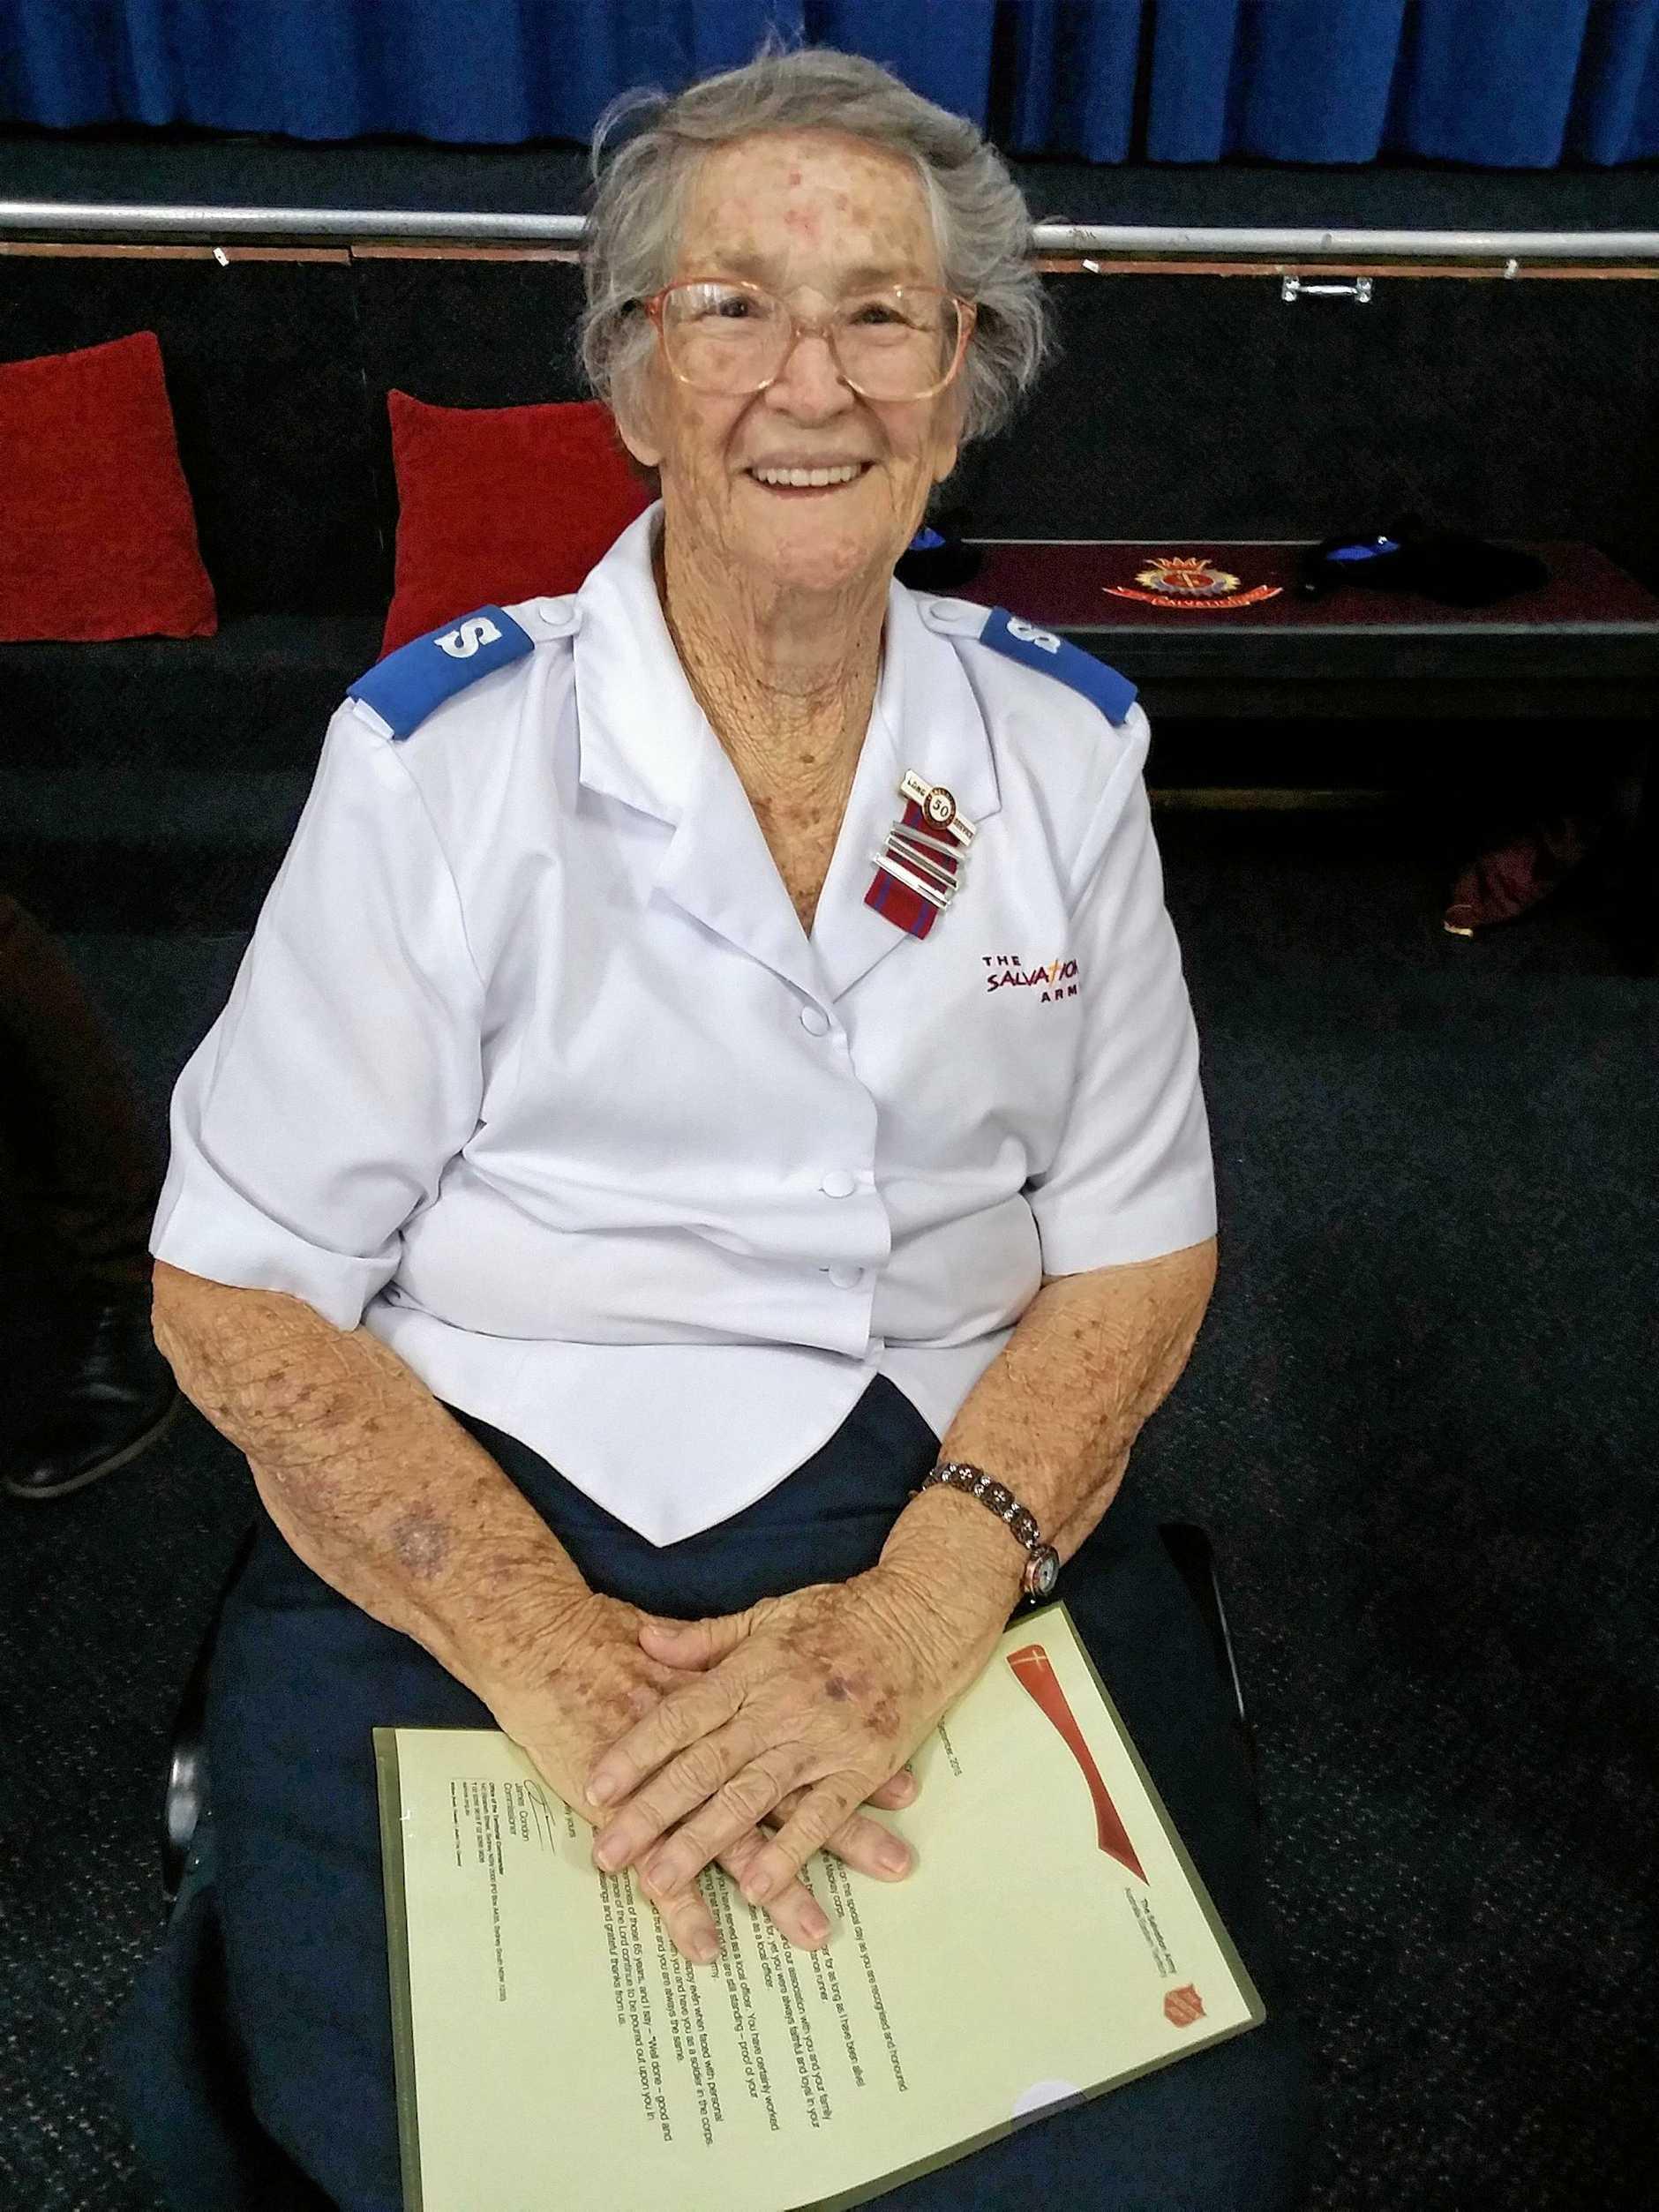 Lori Burgess Community Volunteer winner, Hazel Cooper.